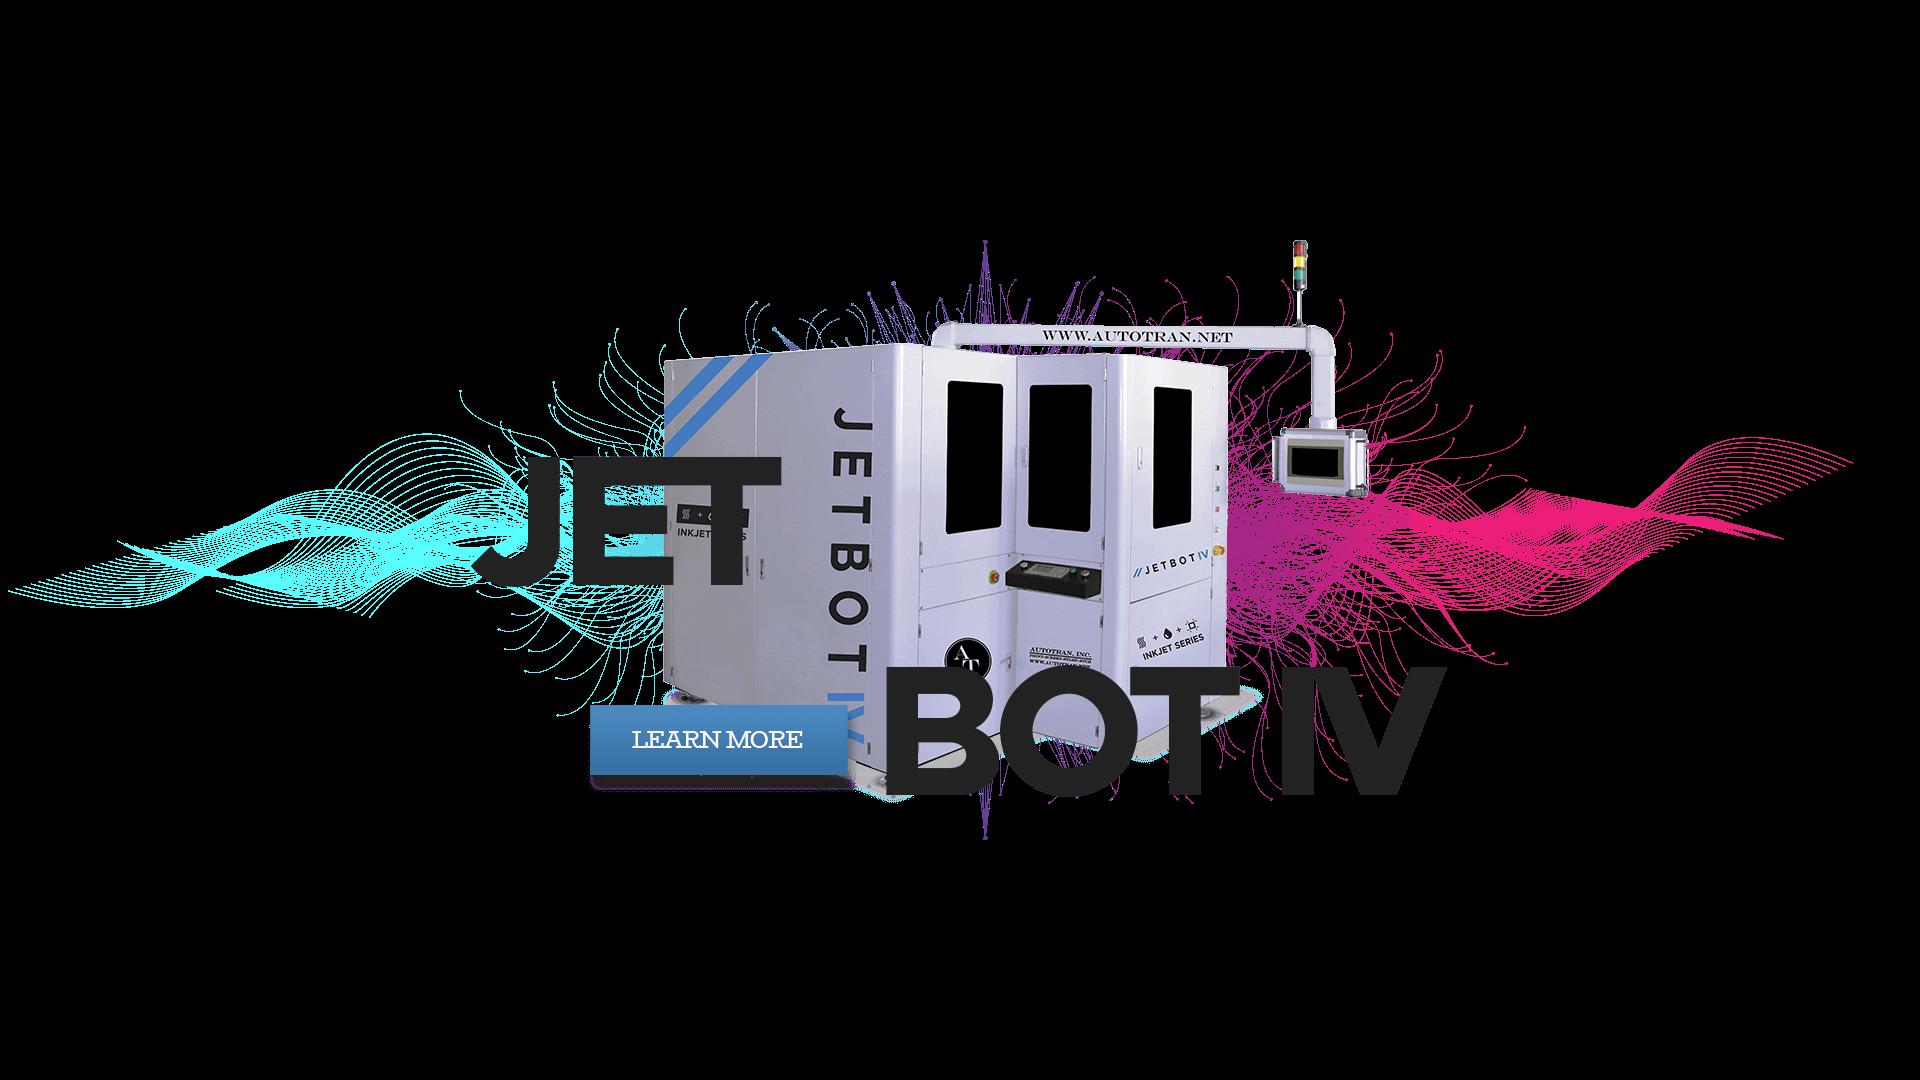 Jetbot 4 Inkjet Printer